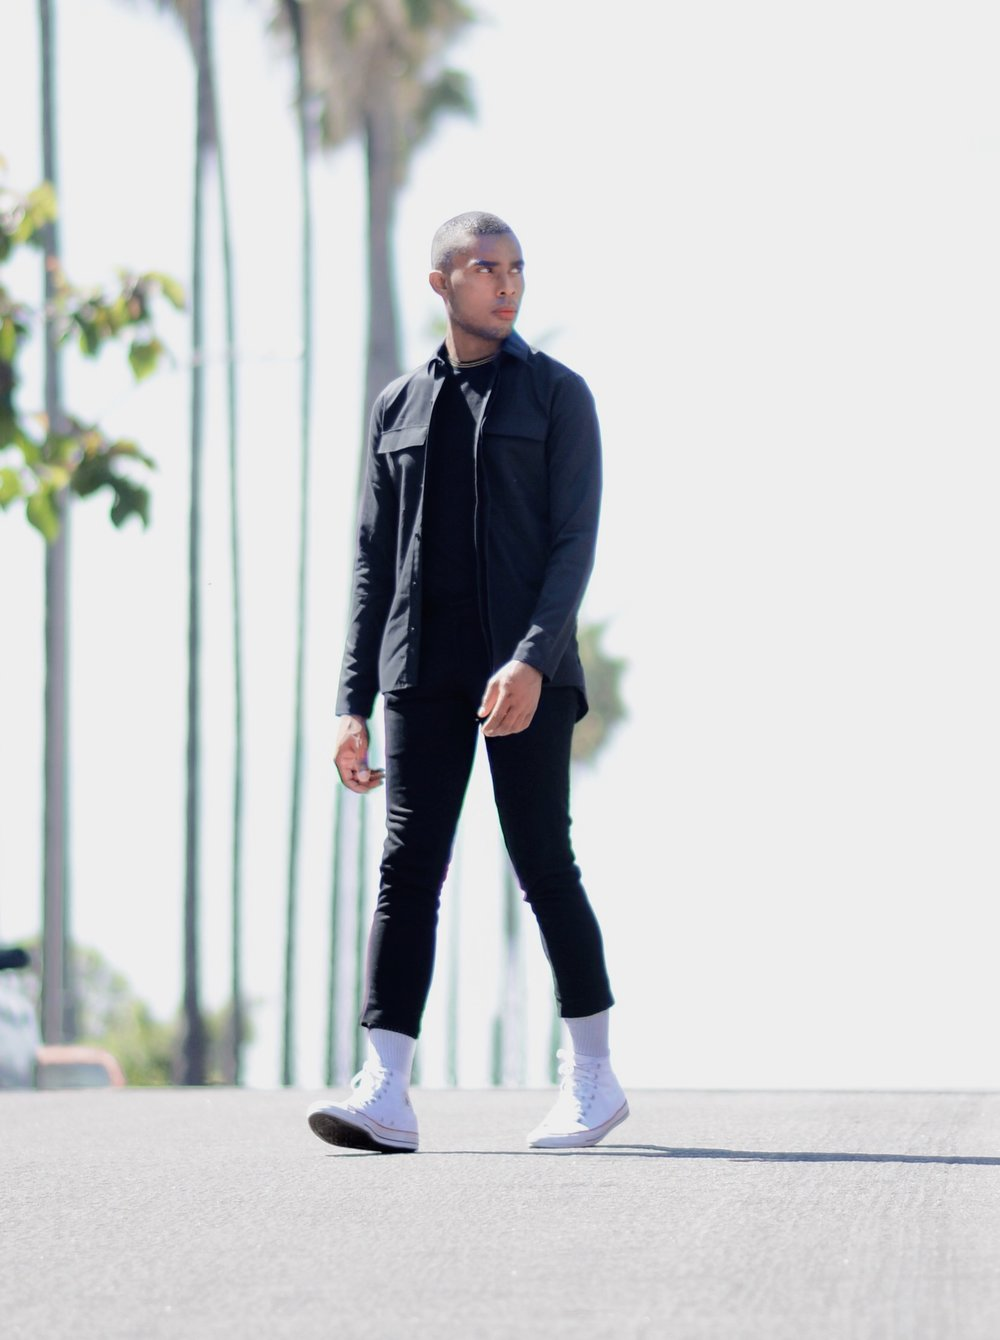 The-Look-Principle-Topman-Utilitarian-Style-2017